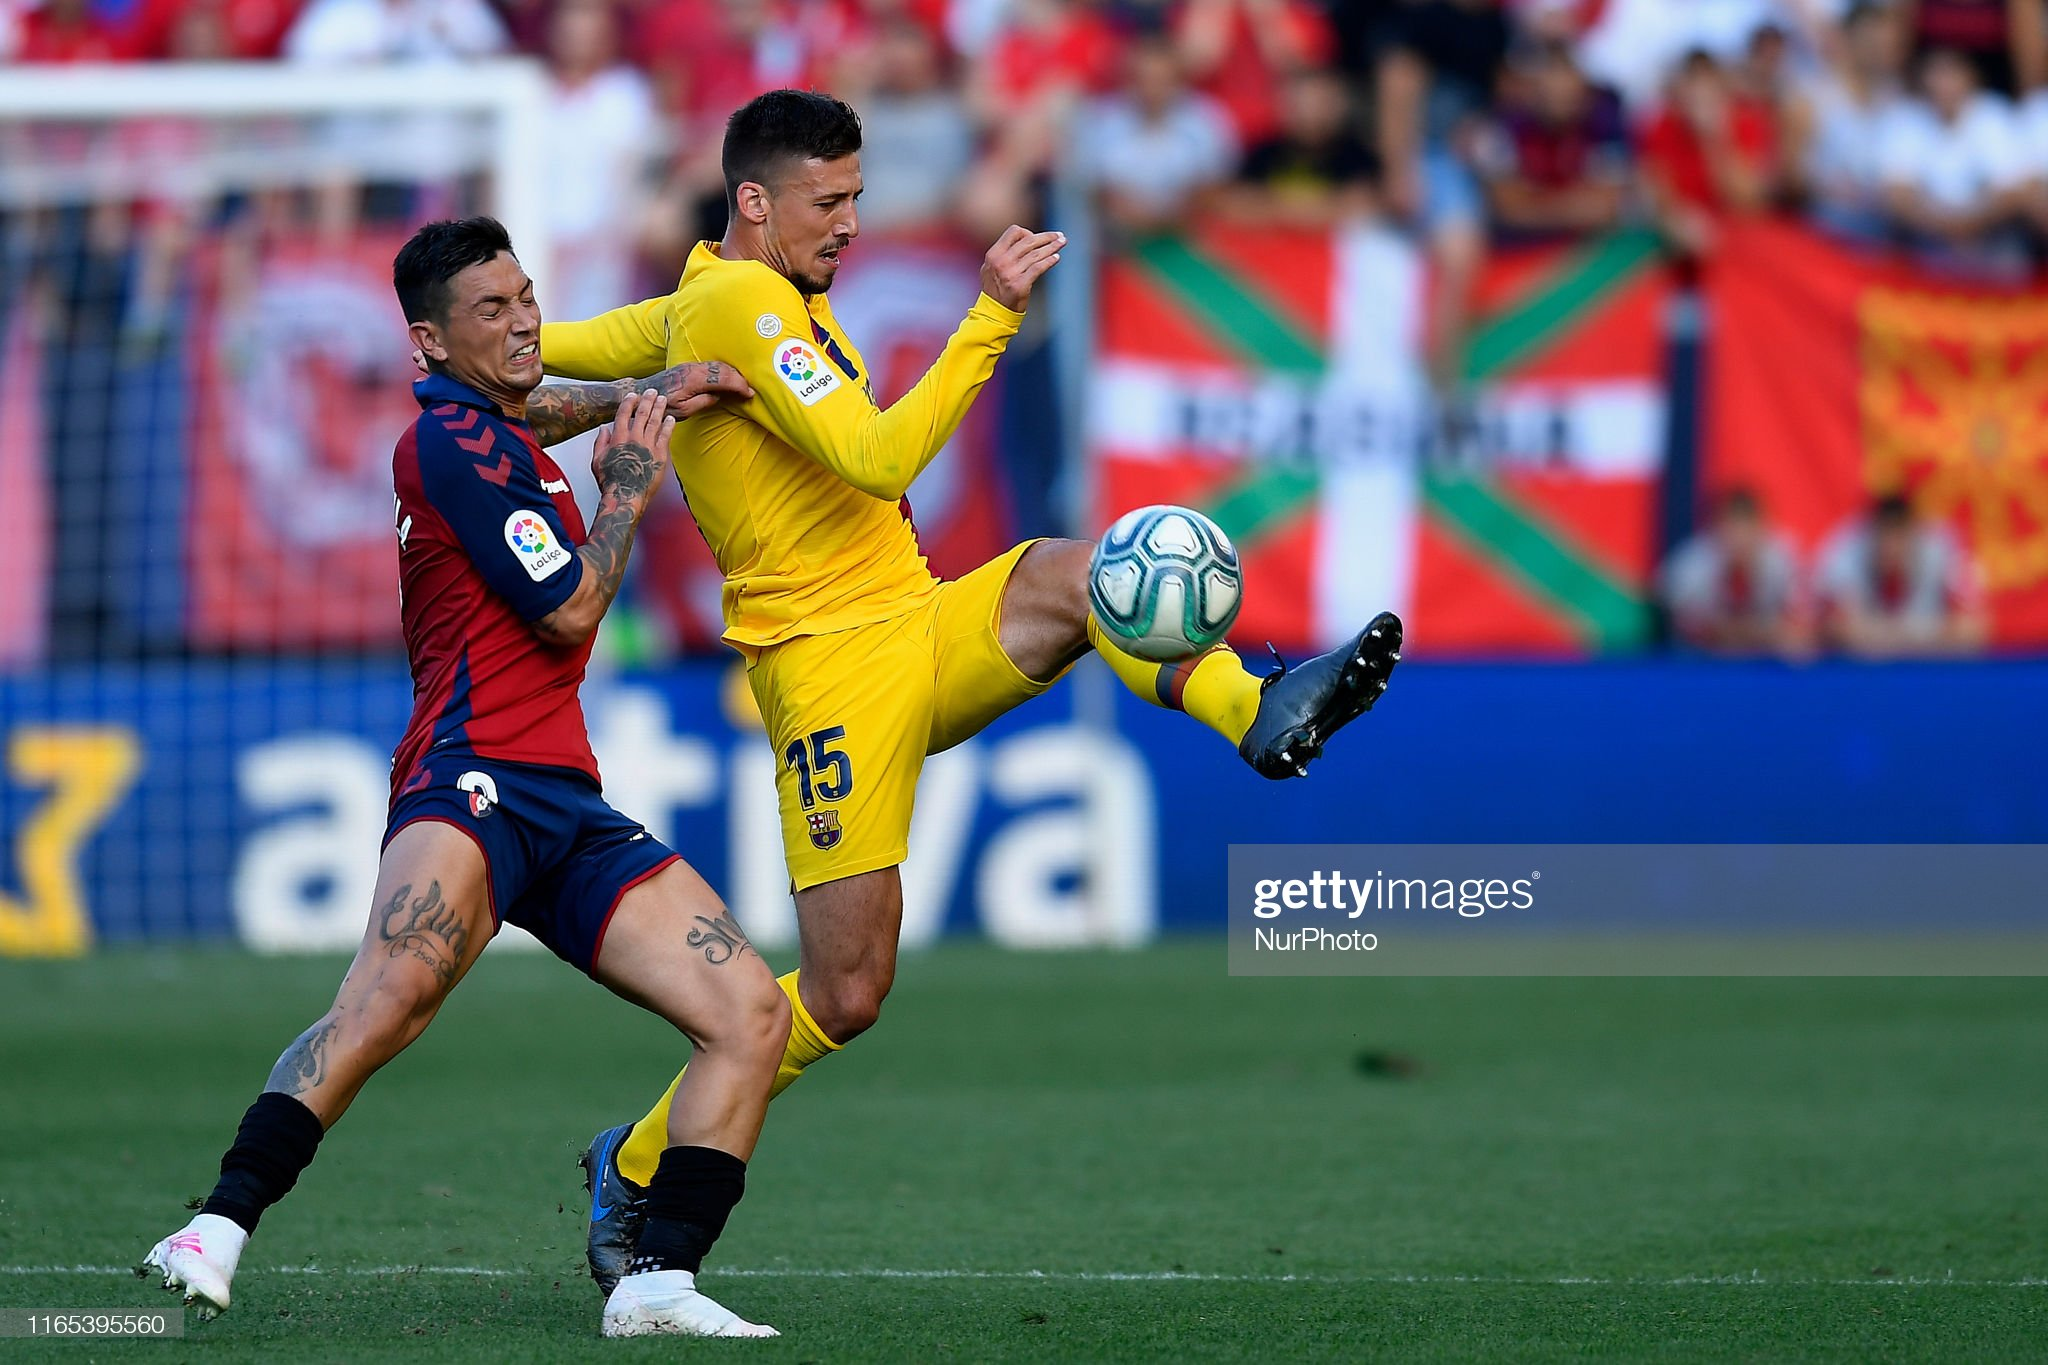 صور مباراة : أوساسونا - برشلونة 2-2 ( 31-08-2019 )  Clement-lenglet-of-barcelona-and-chimy-avila-of-osasuna-competes-for-picture-id1165395560?s=2048x2048